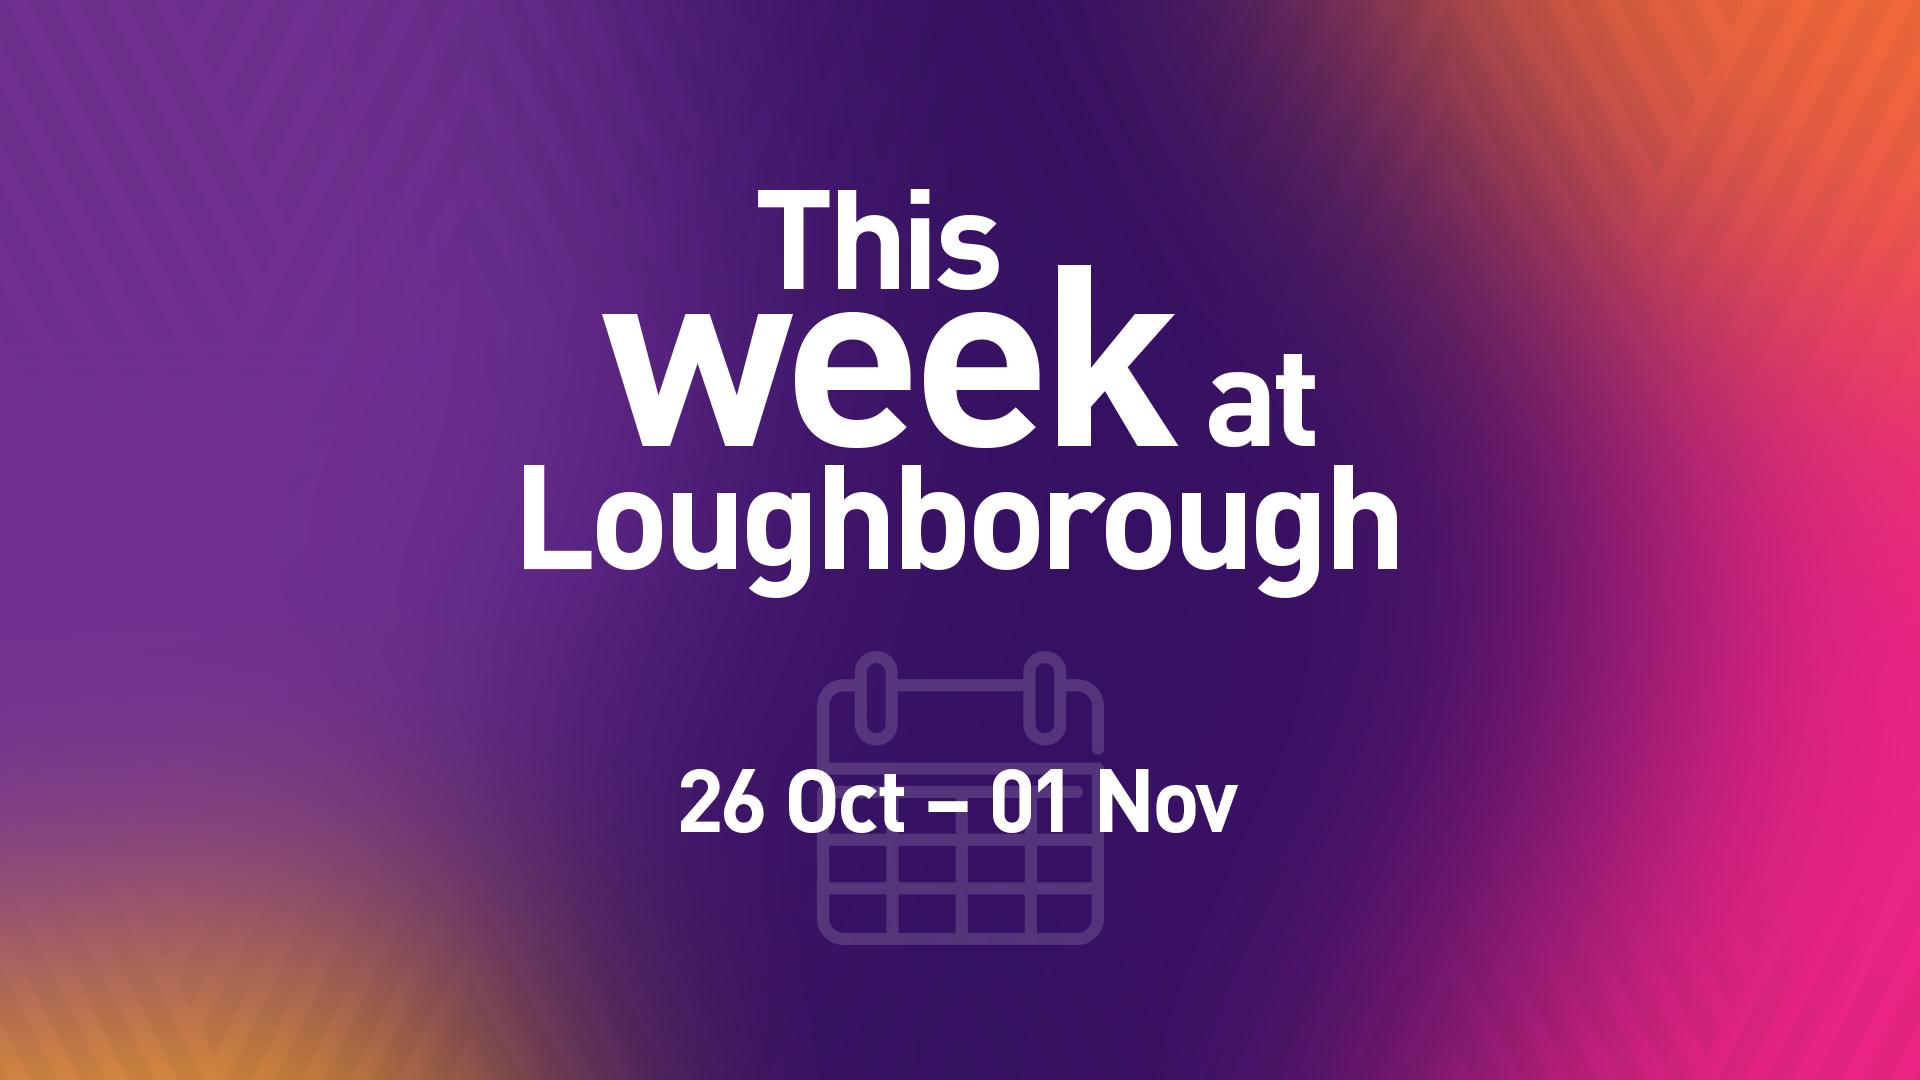 This Week at Loughborough | 26 October